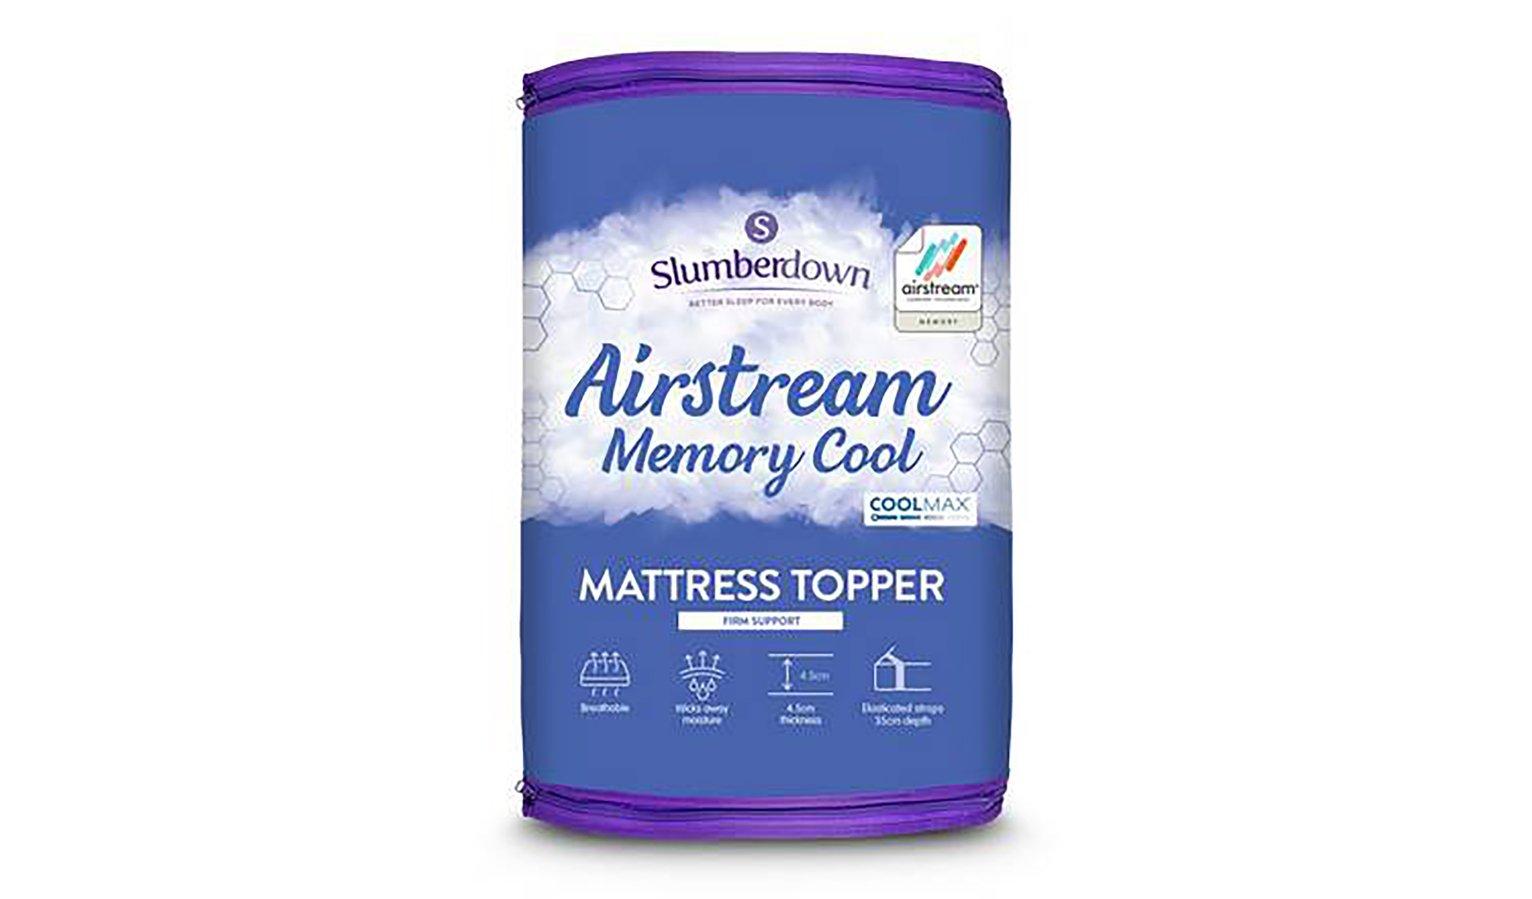 Slumberdown Airstream Memory Fibre Mattress Topper -Kingsize